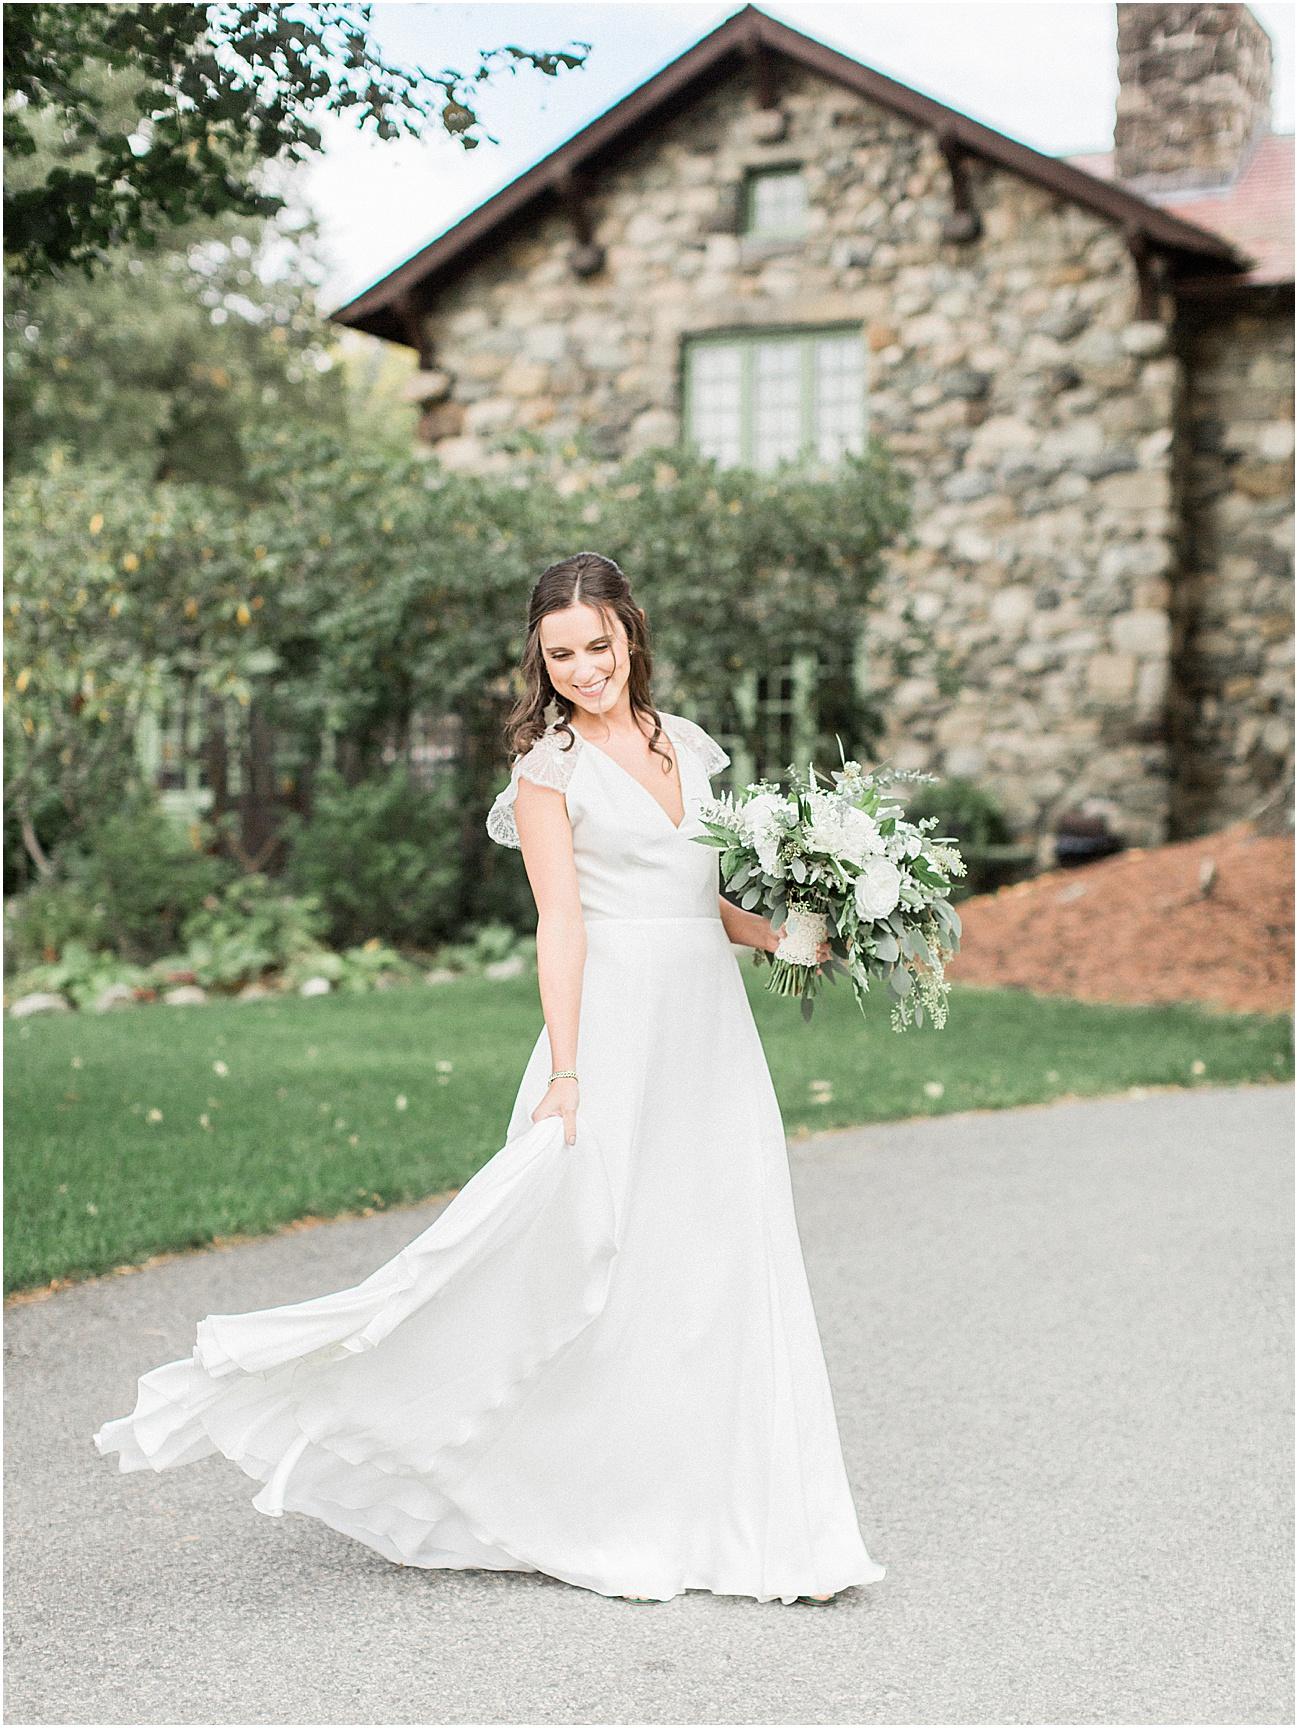 jenna_mike_willowdale_estate_topsfield_neutral_whites_greens_fall_cape_cod_boston_wedding_photographer_meredith_jane_photography_photo_1442.jpg